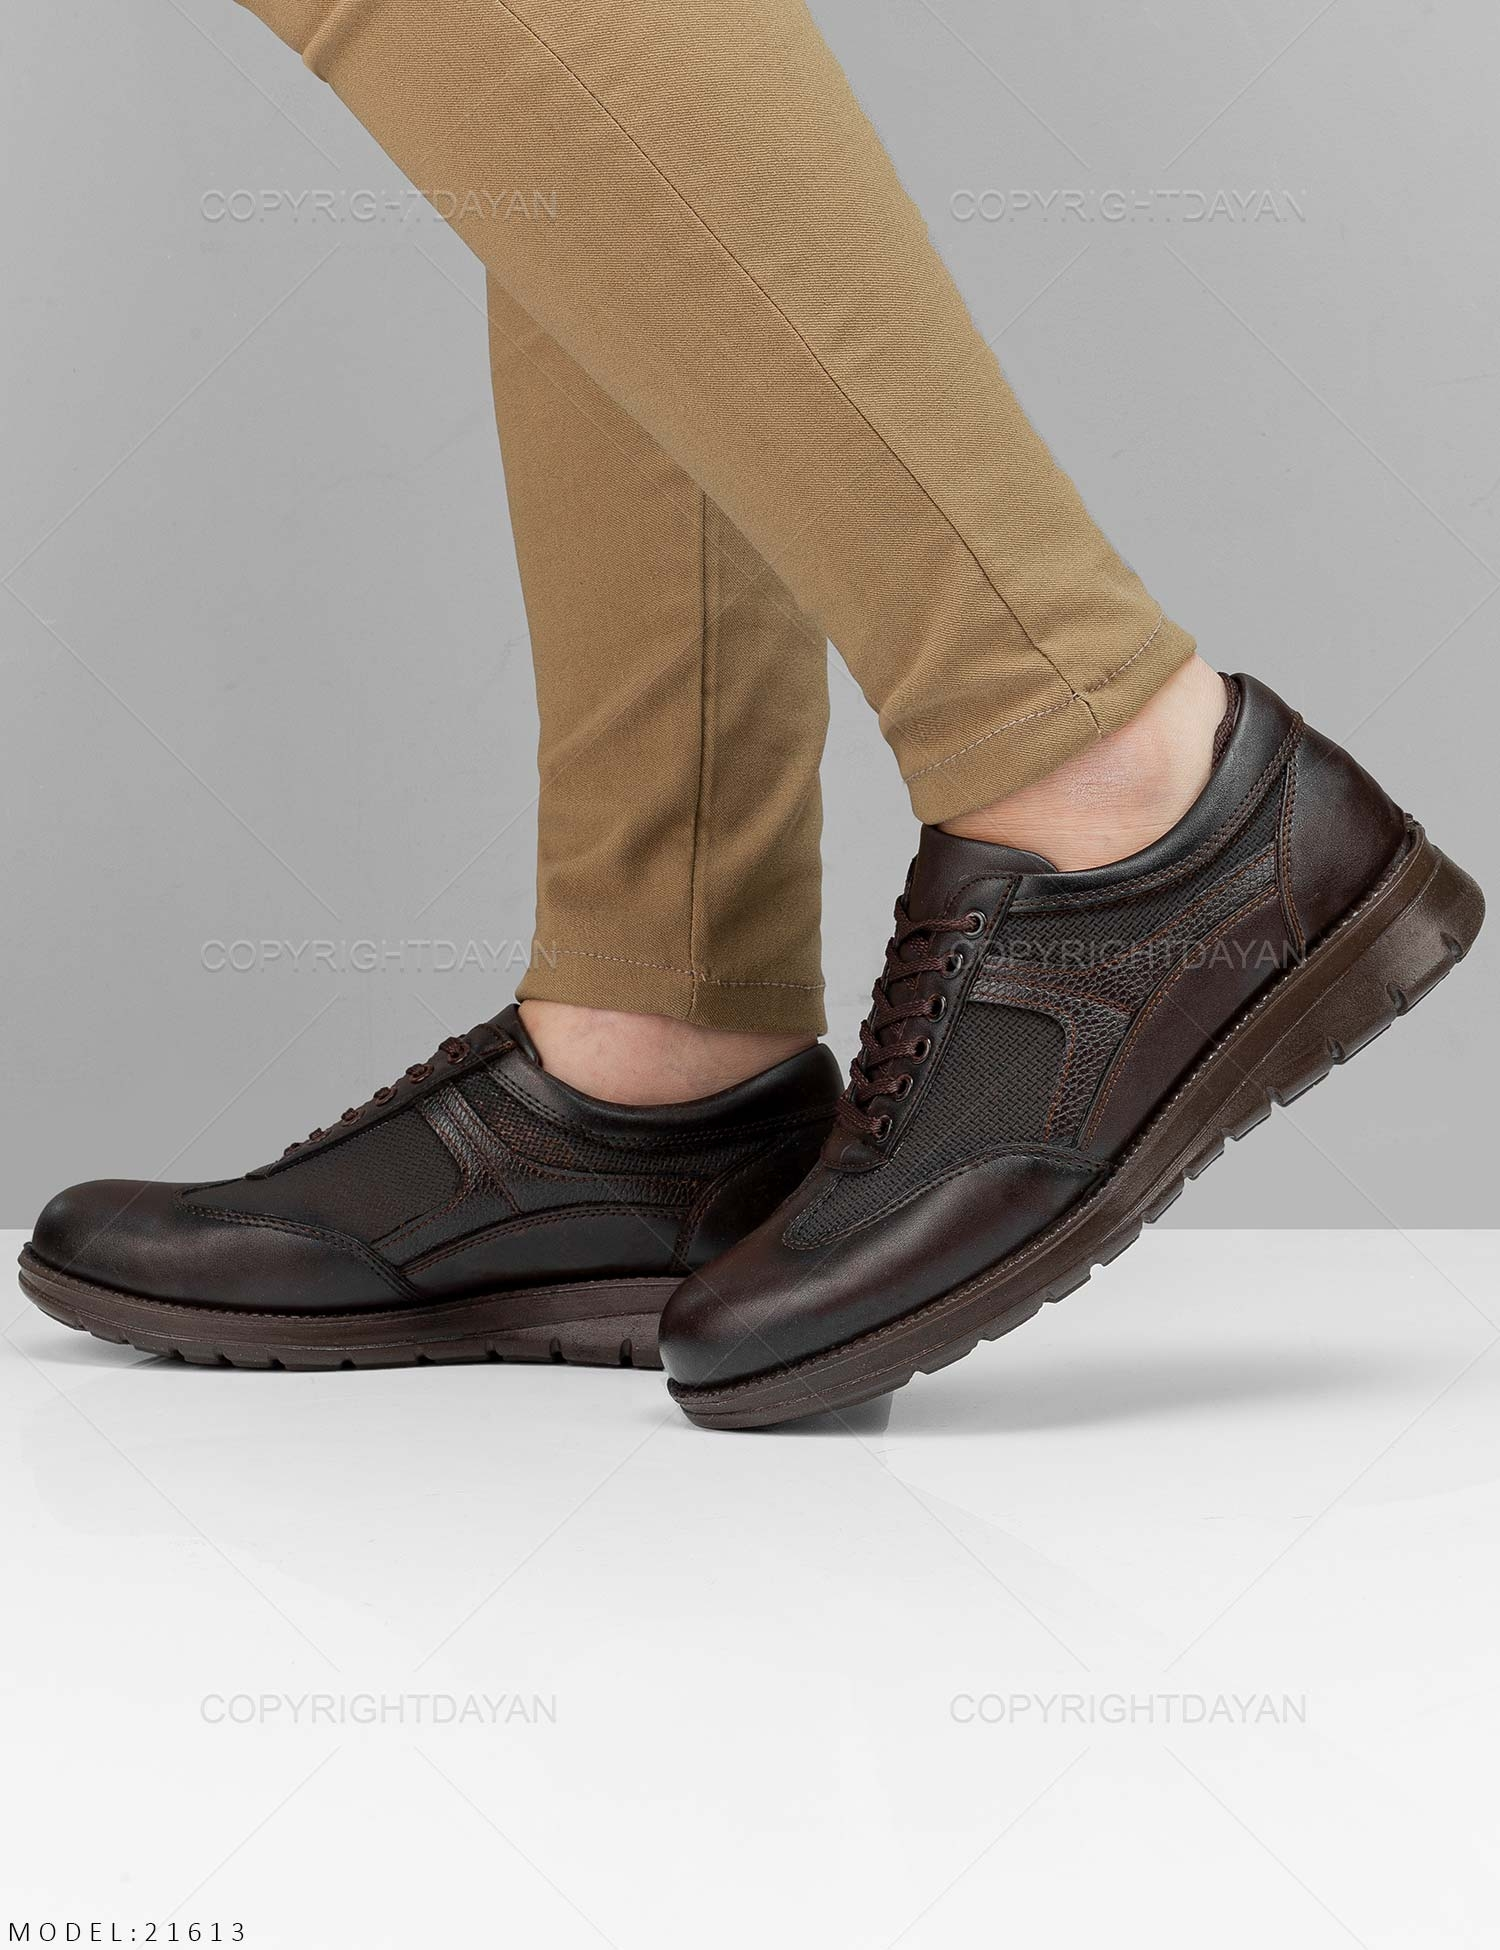 کفش روزمره مردانه Karen مدل 21613